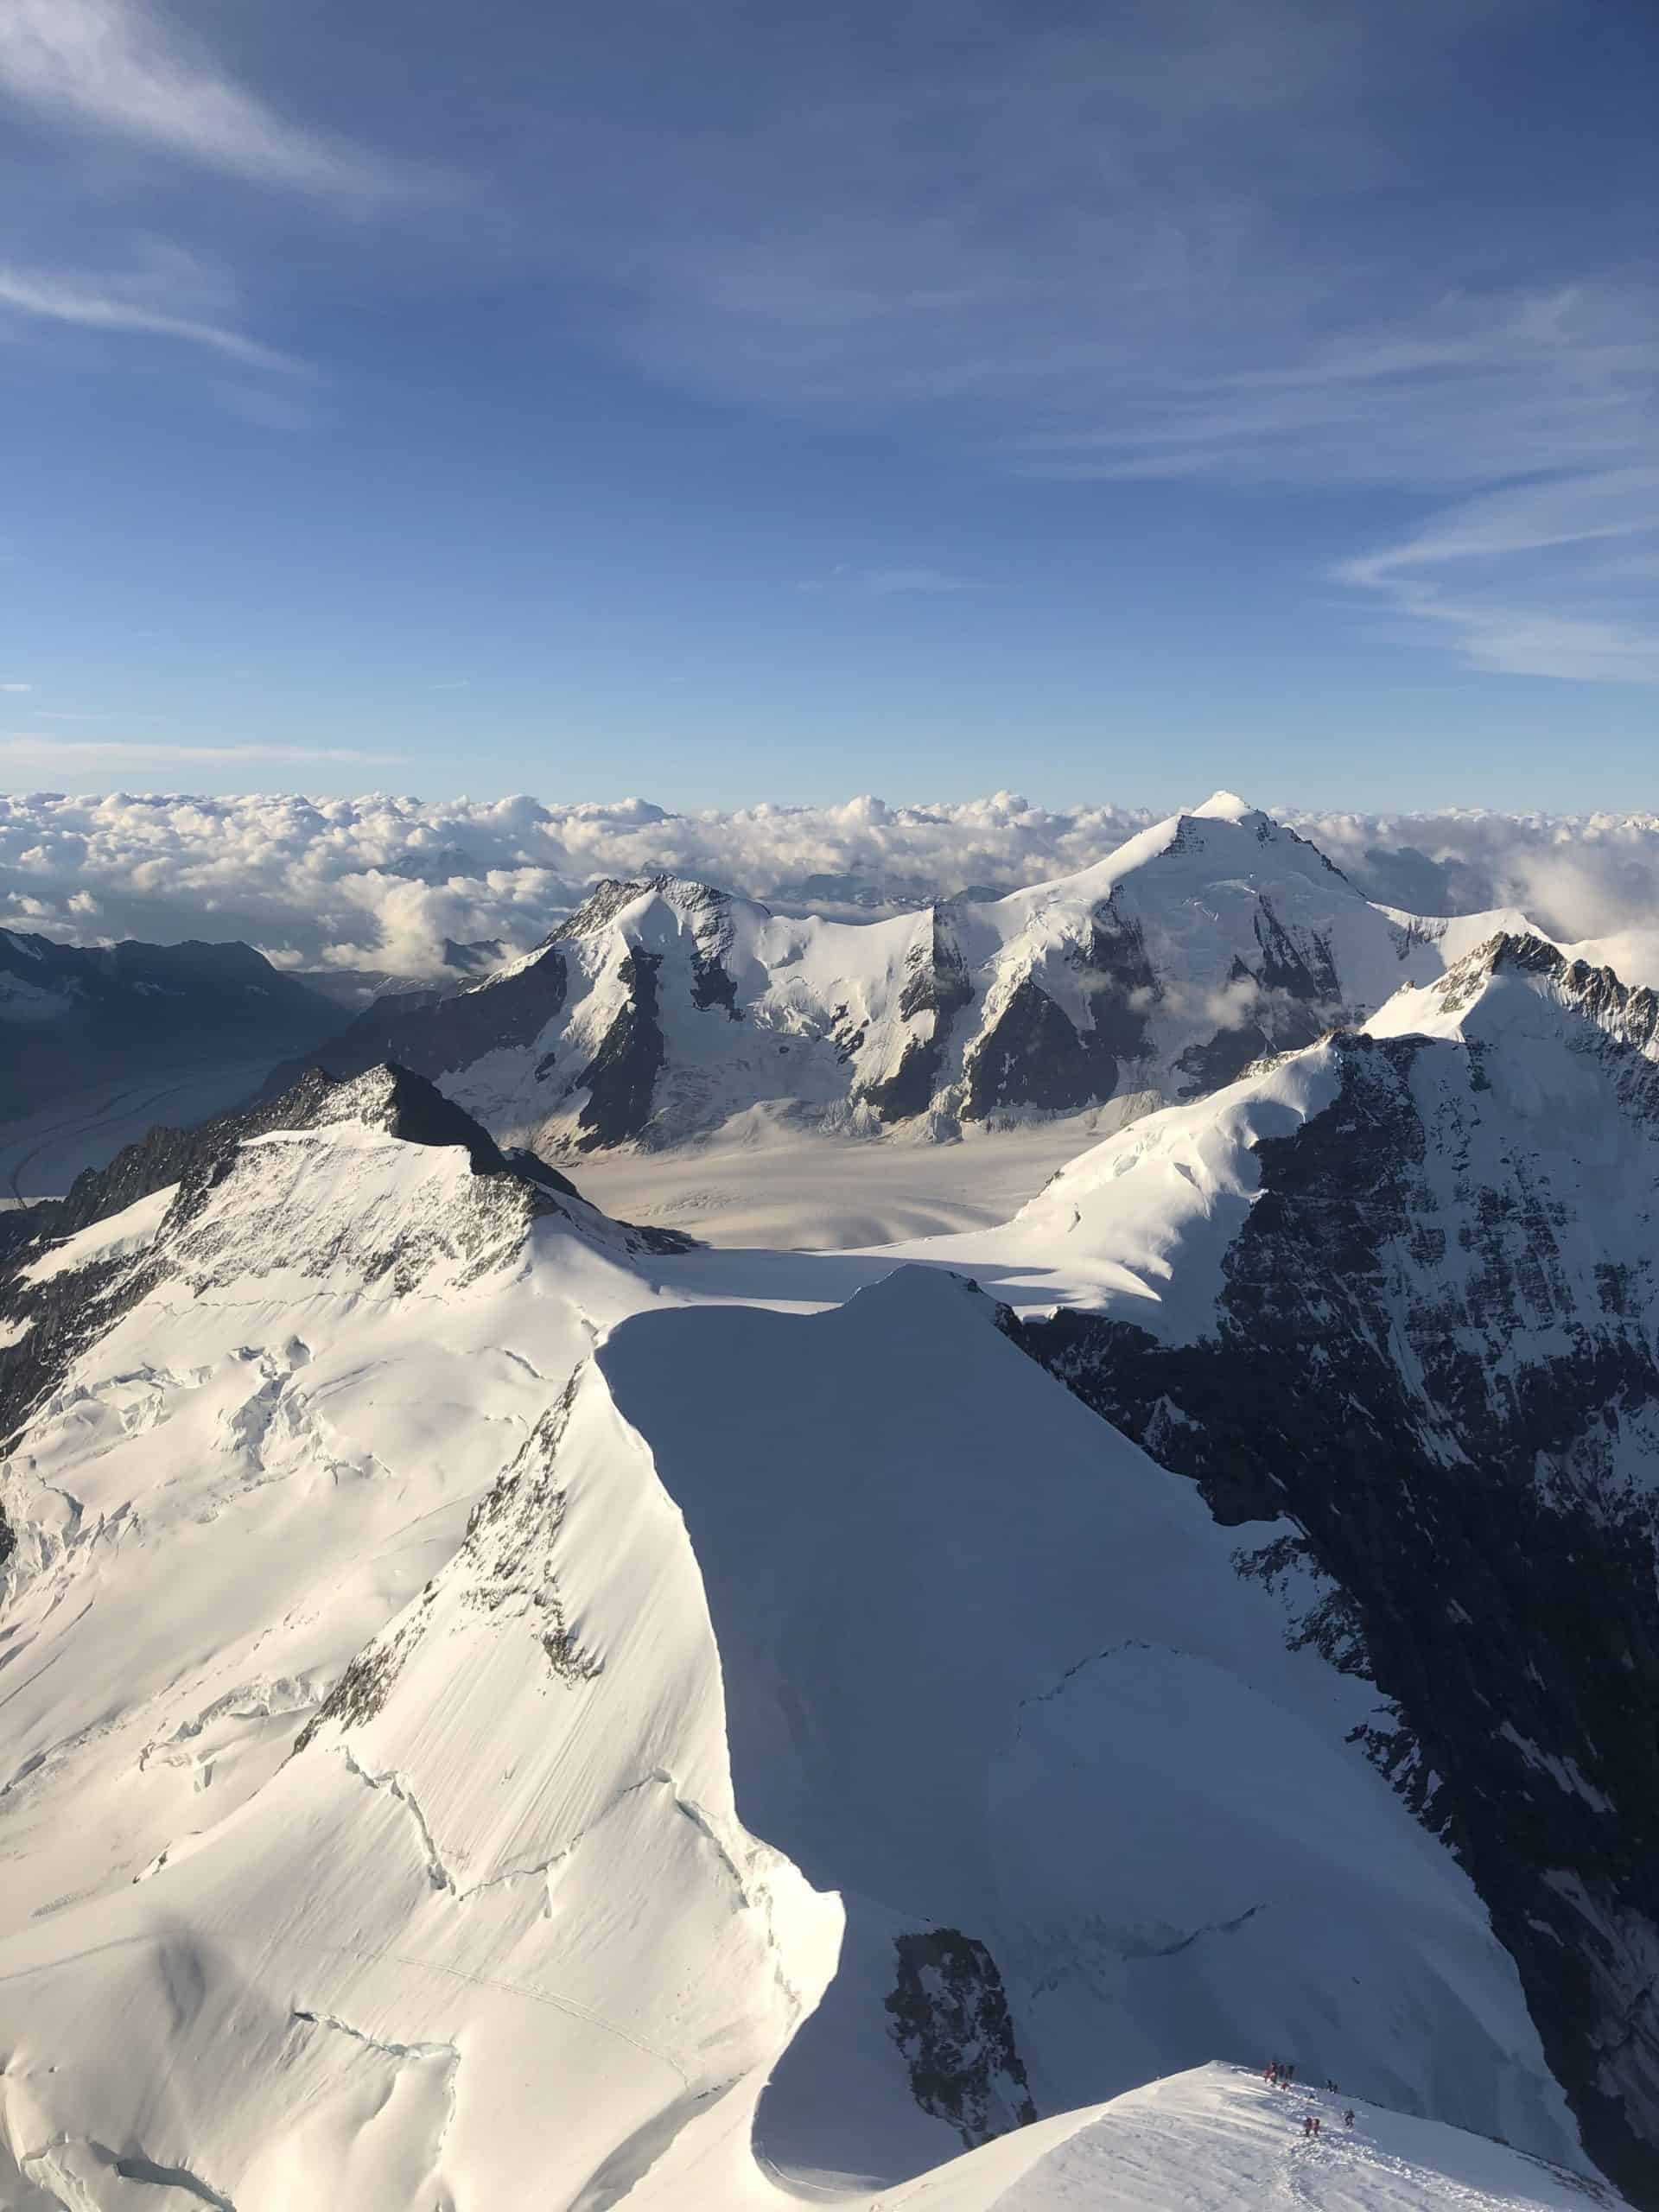 IMG 2936 scaled - Jungfrau - der Star im Berner Oberland